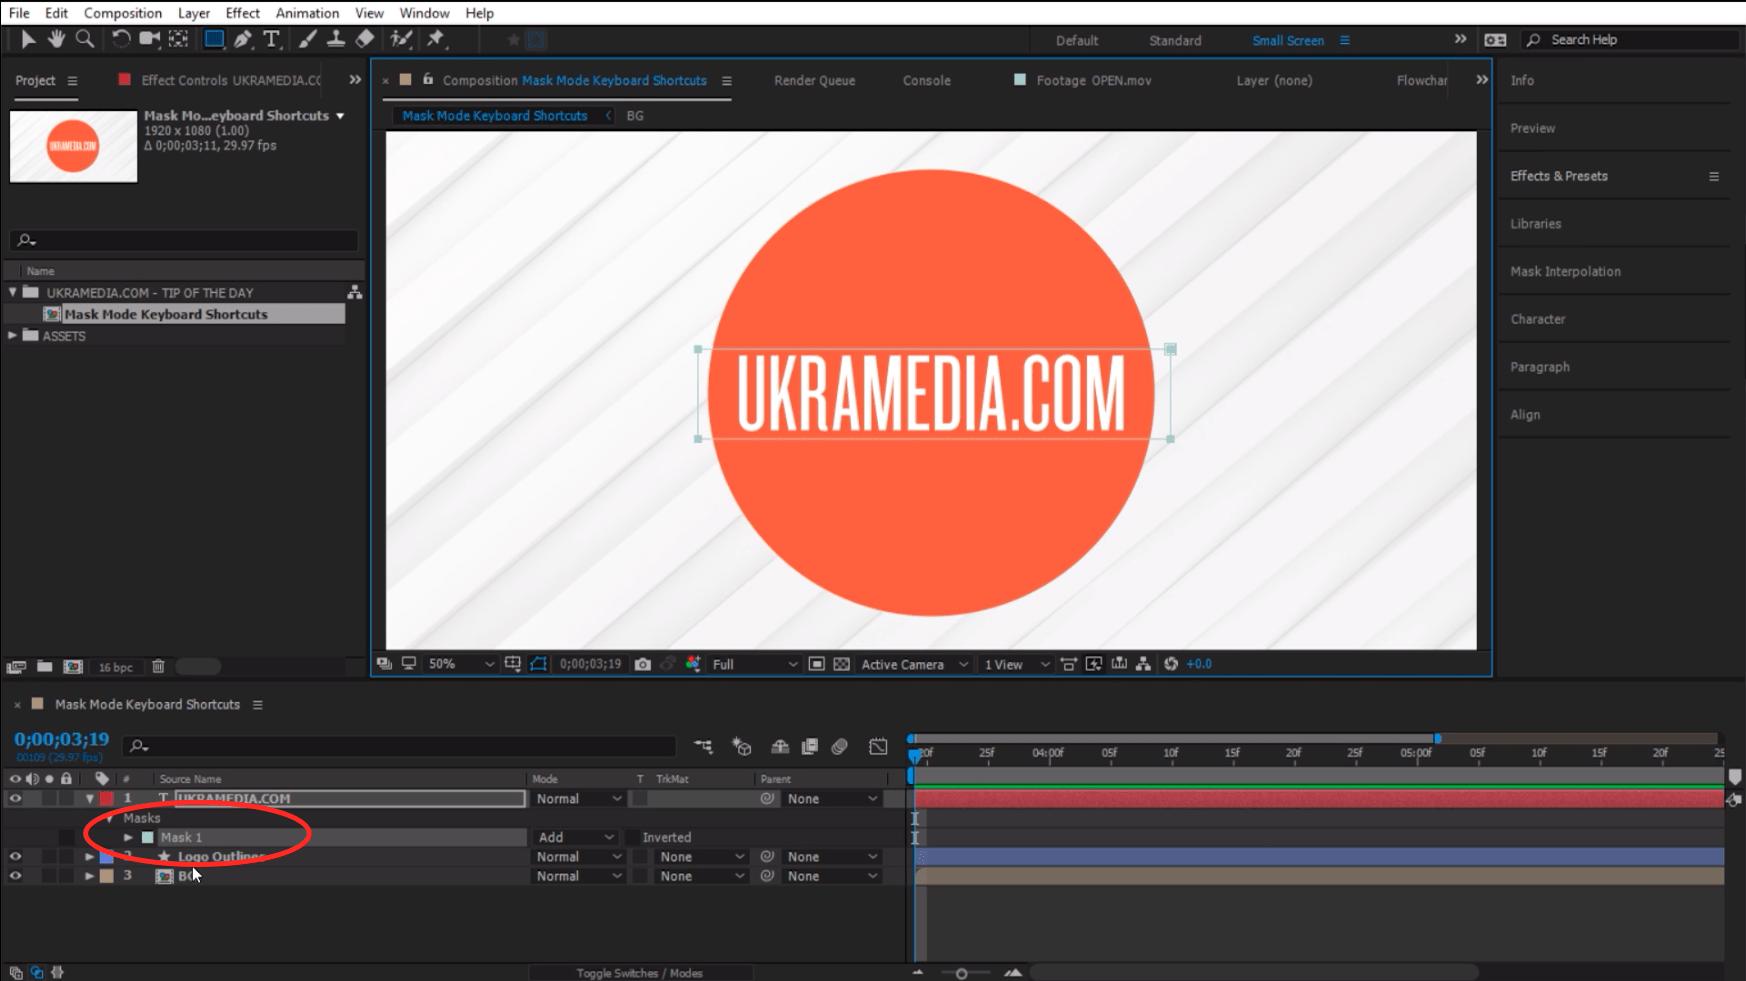 Adobe After Effects Mask Mode Keyboard Shortcuts